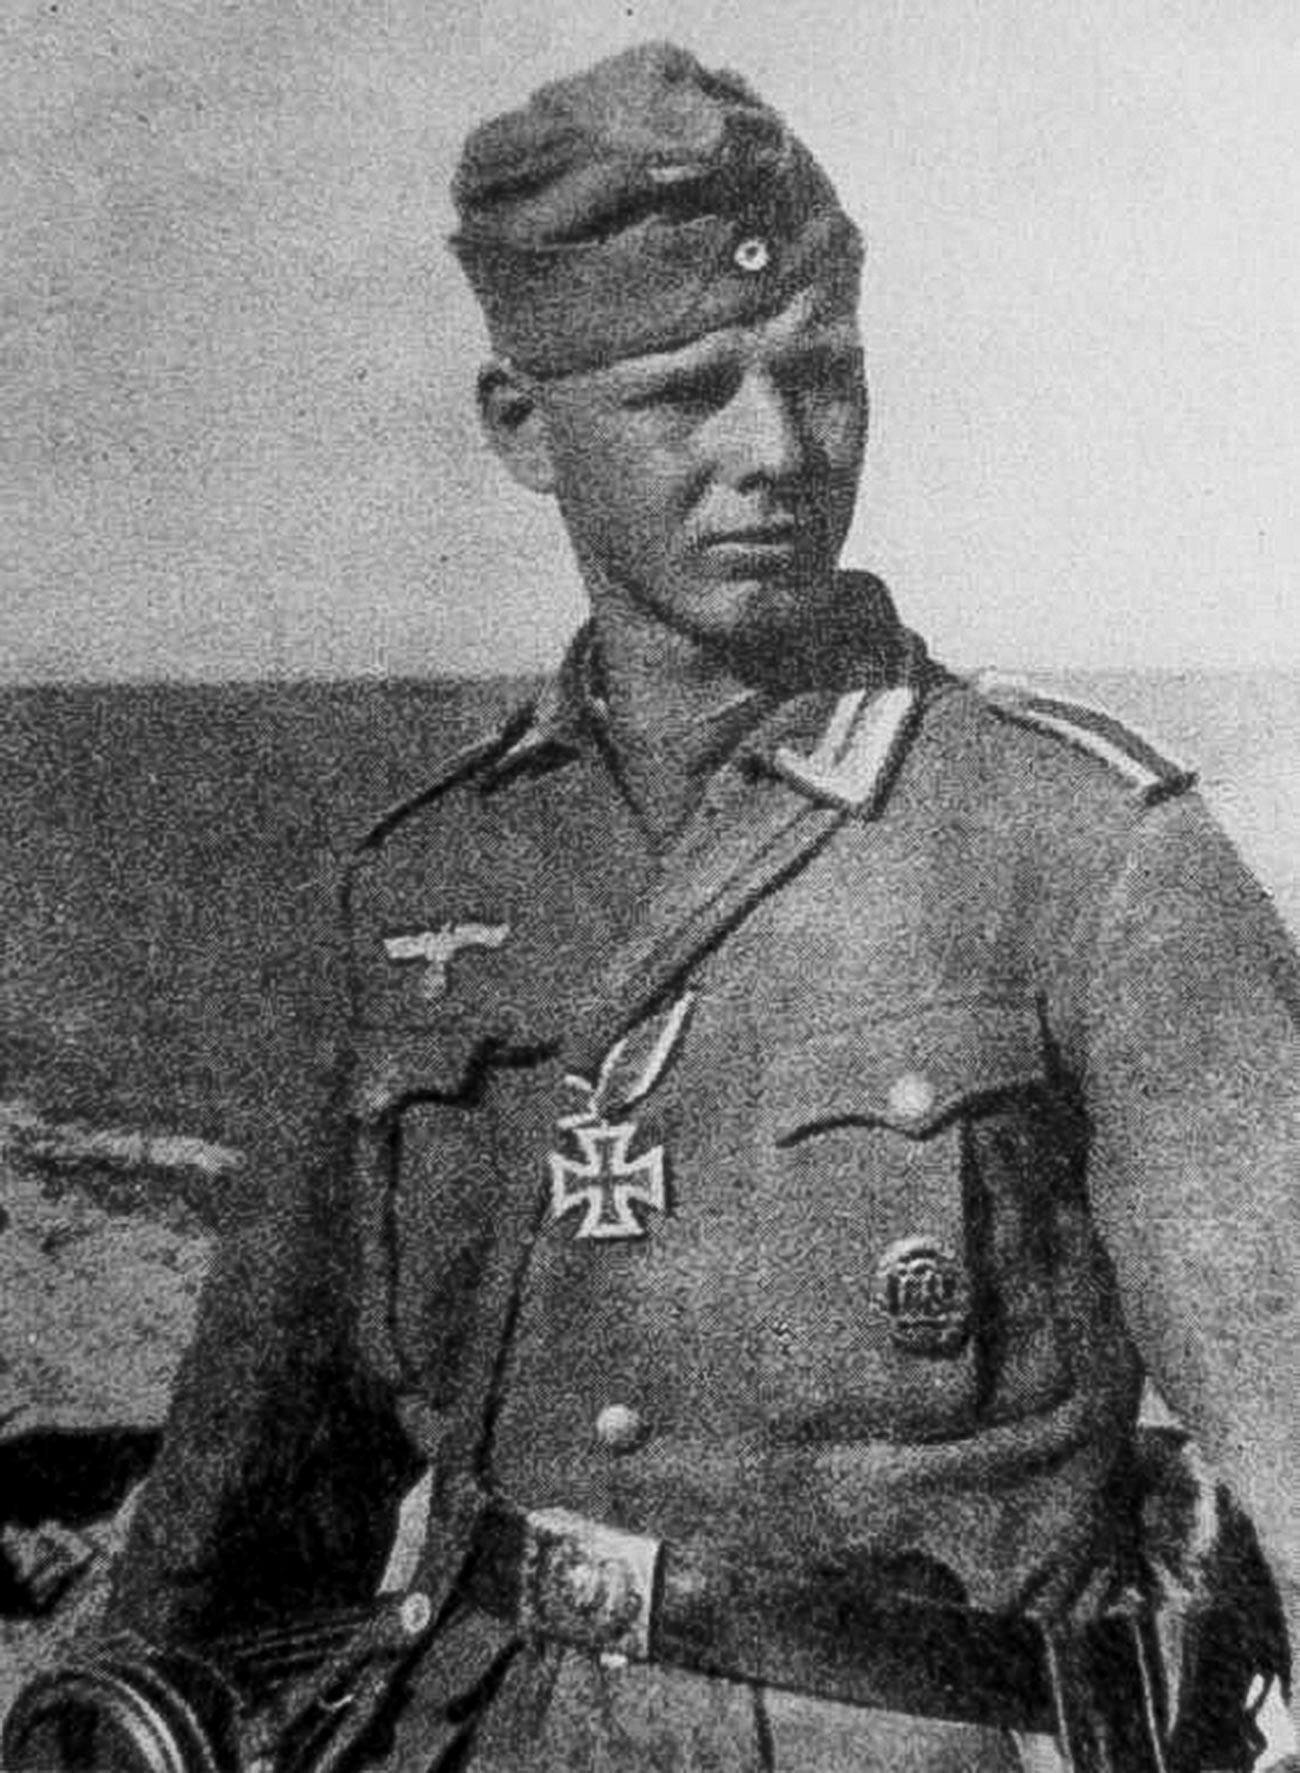 Heinz Hitler.